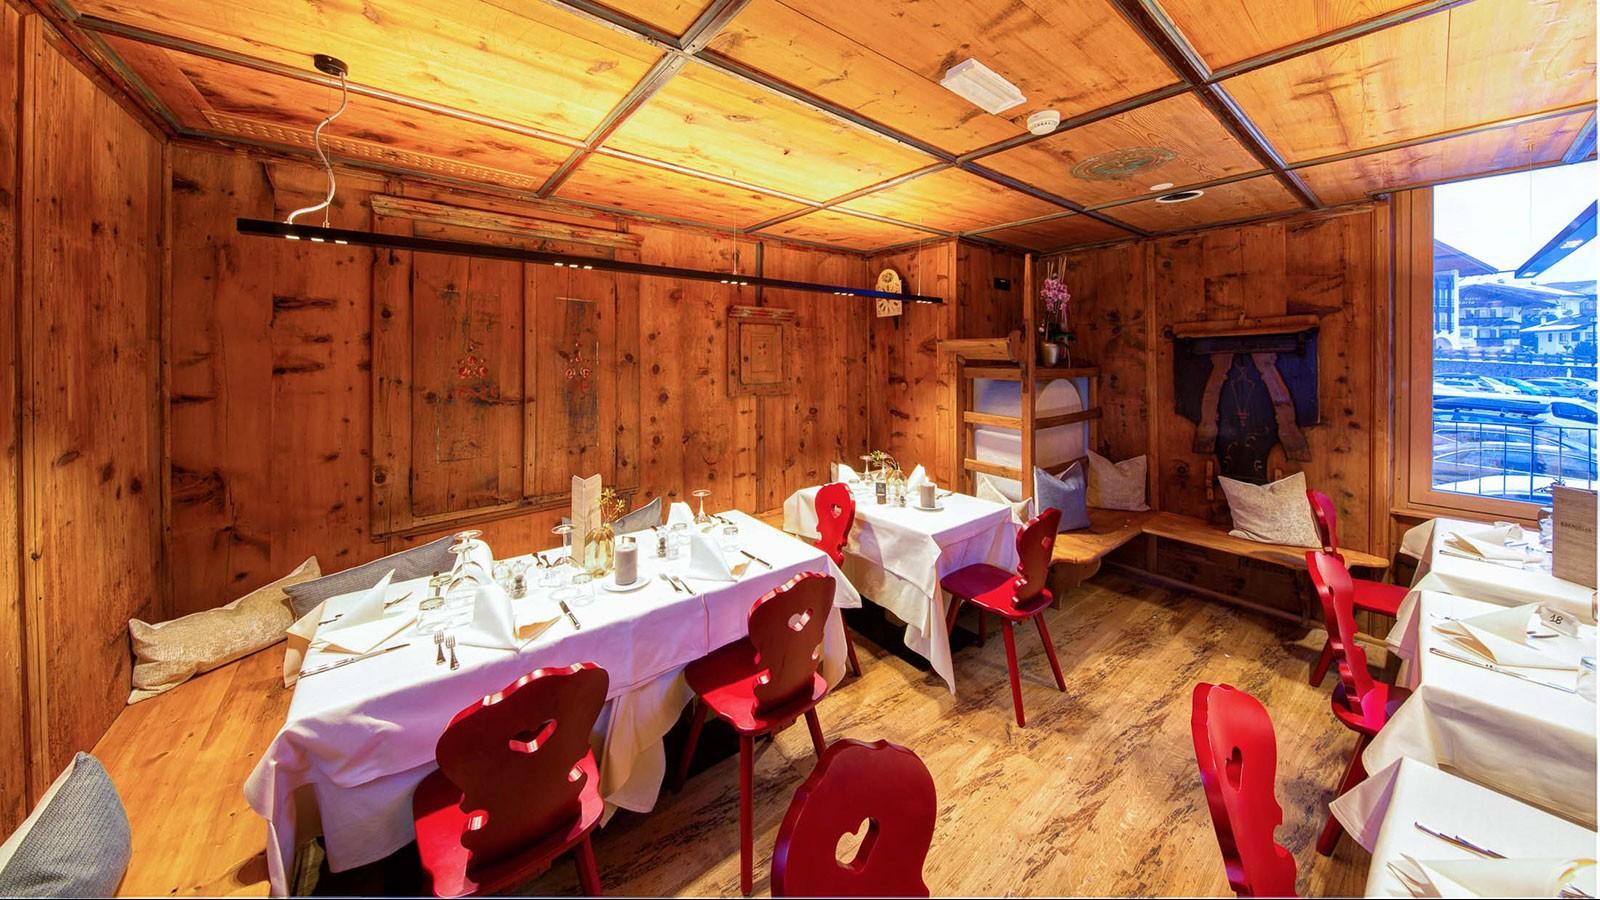 Mountain Design Hotel Eden Selva- Dining